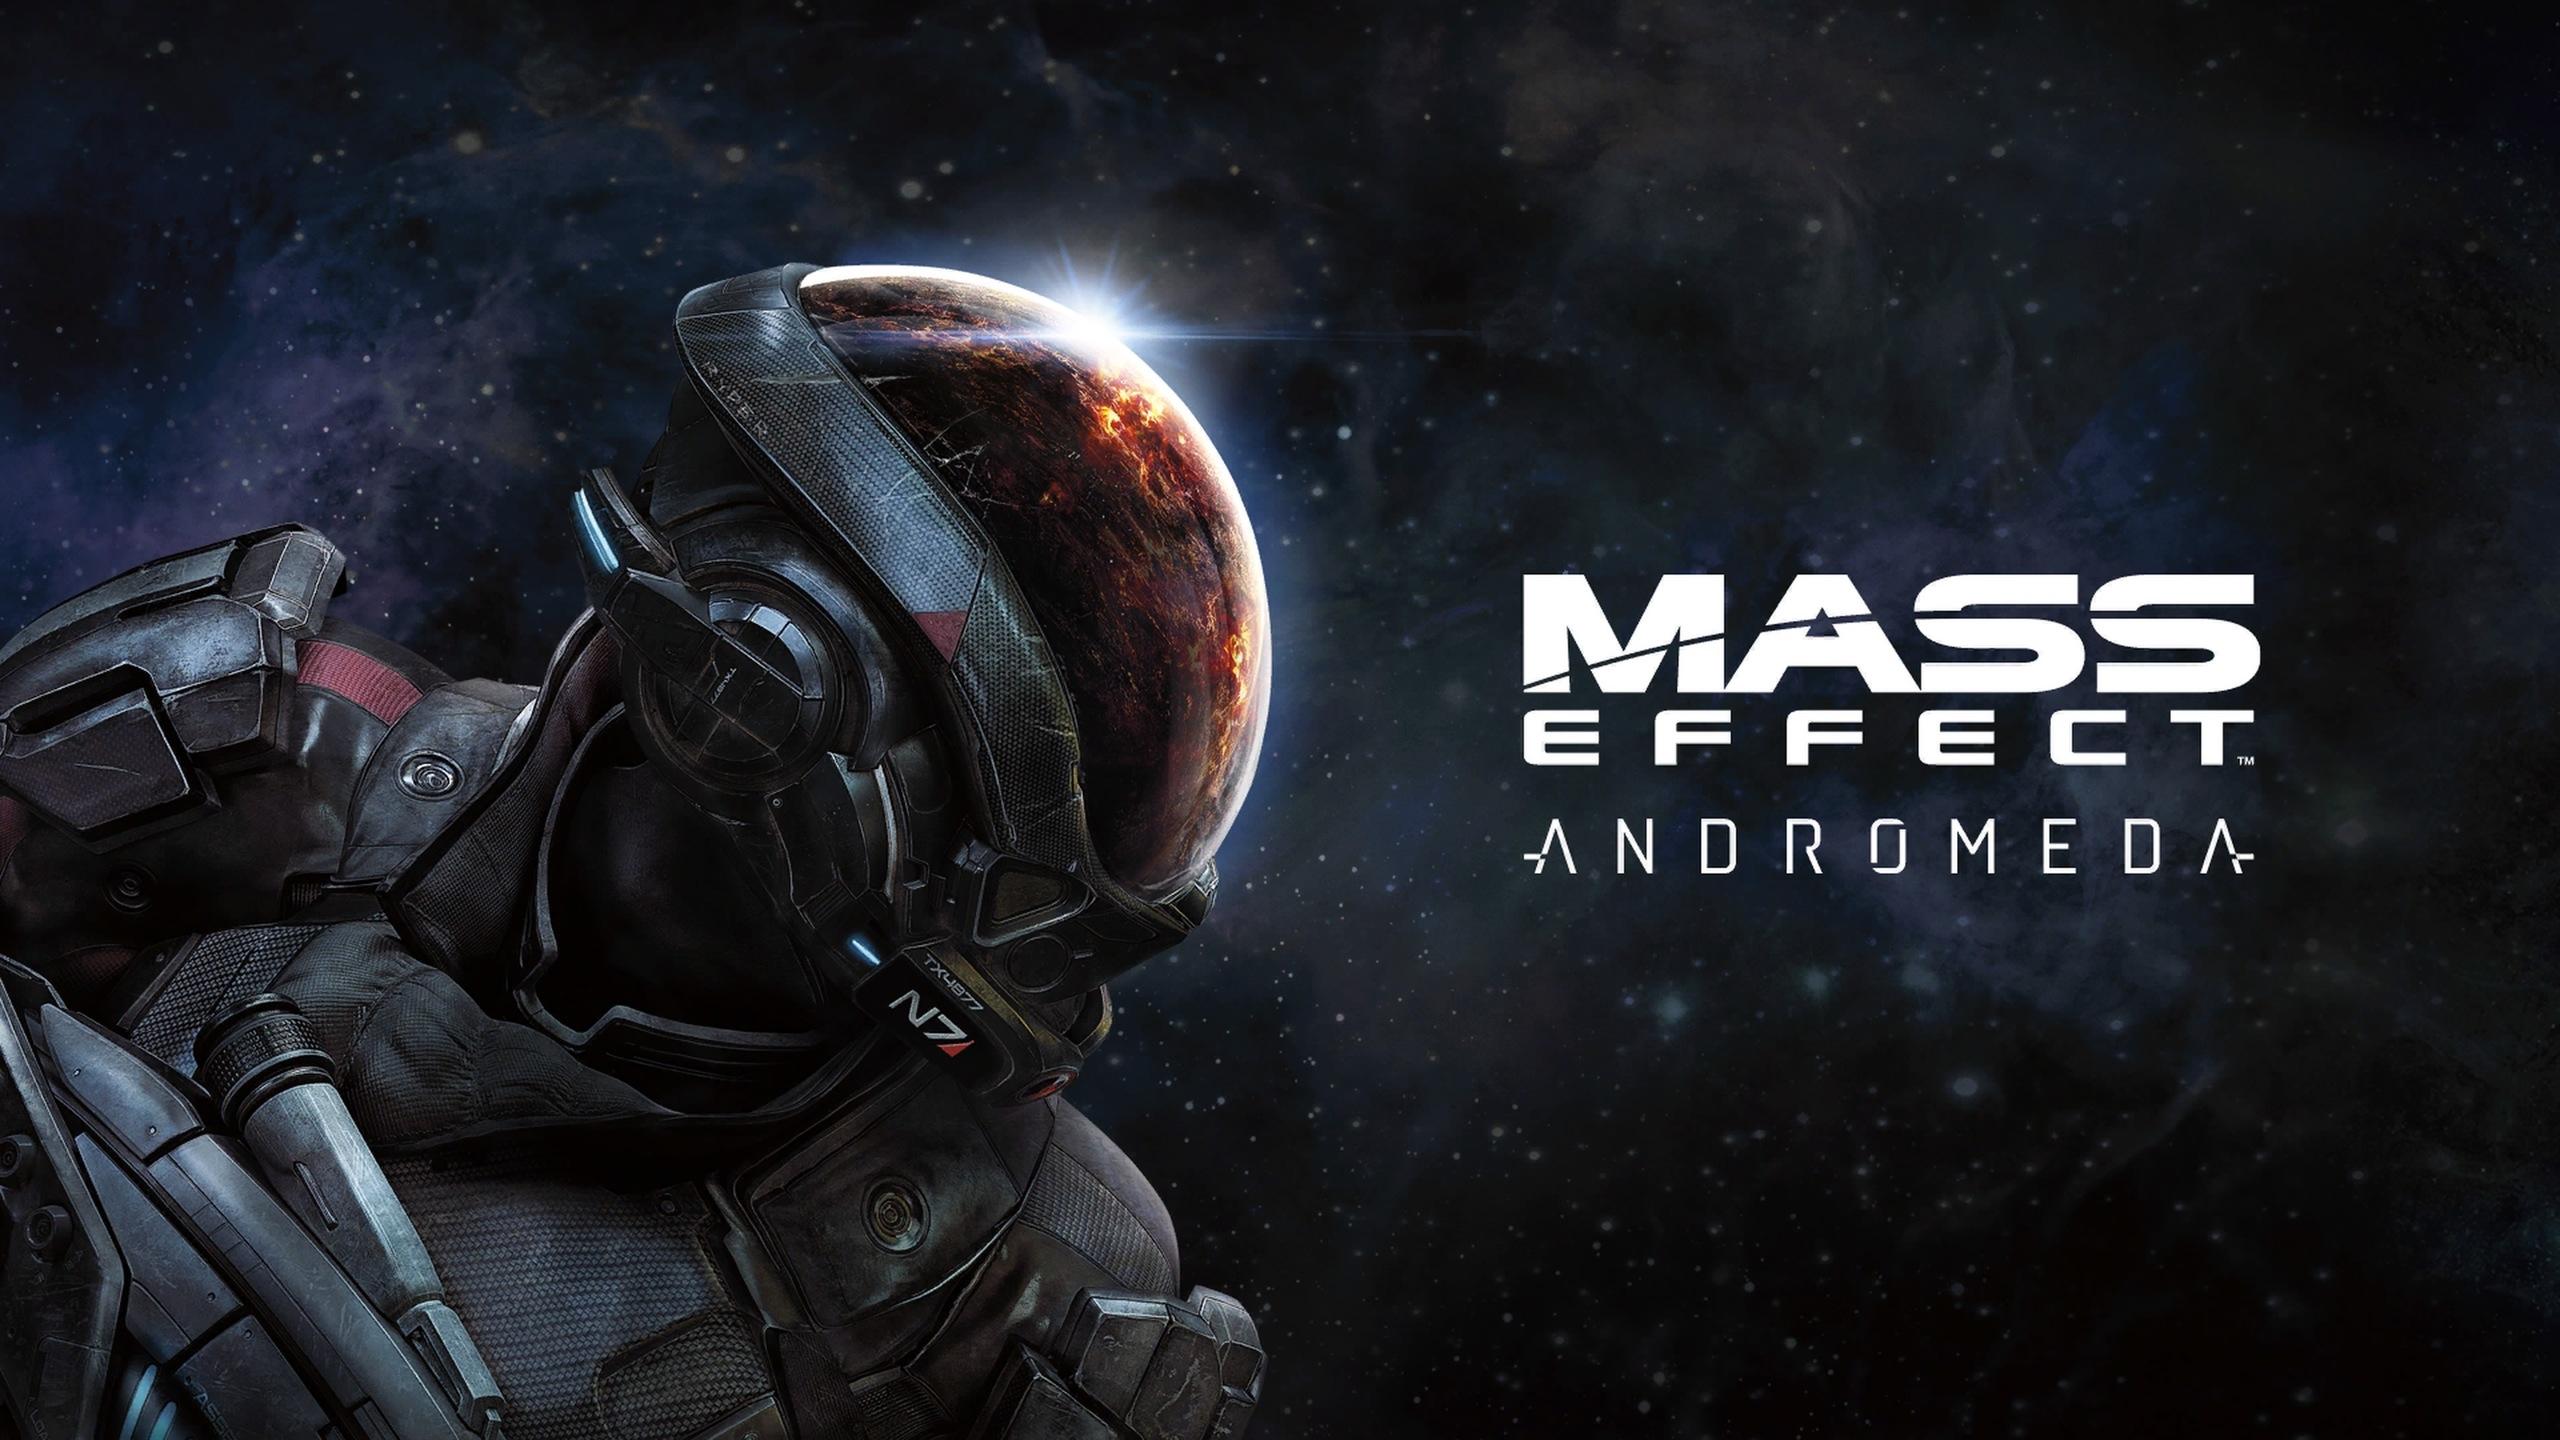 2560x1440 Mass Effect Andromeda 4k 1440P Resolution HD 4k ...